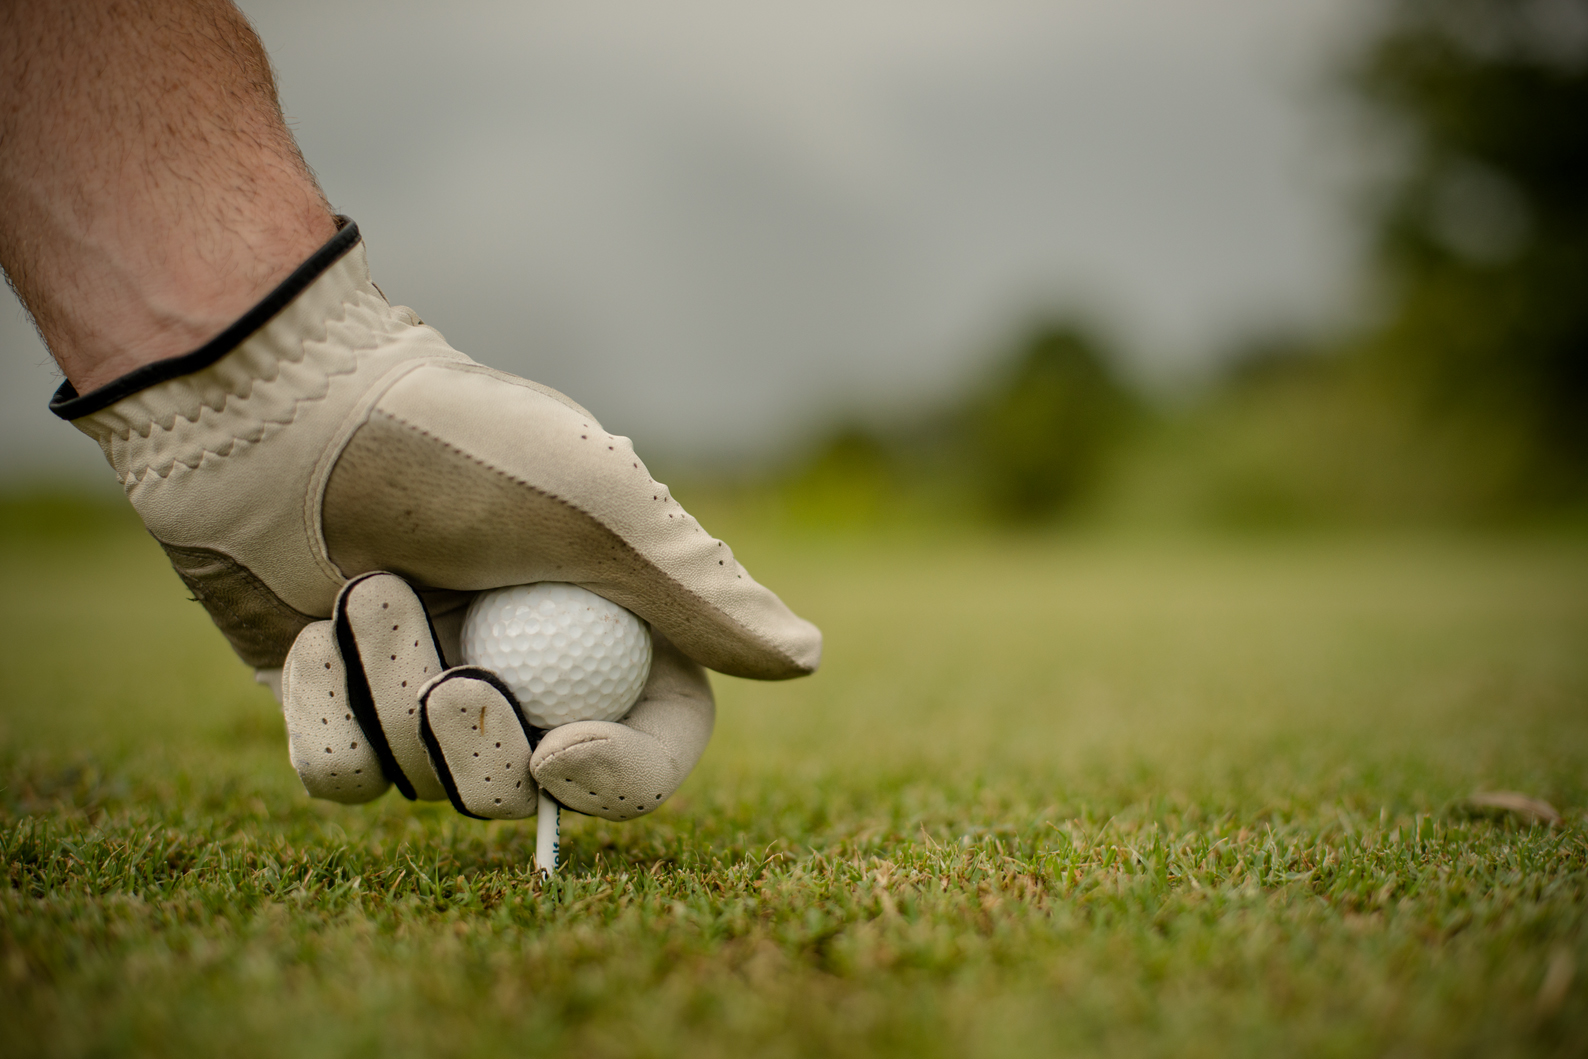 A man sets a golf ball on the tee